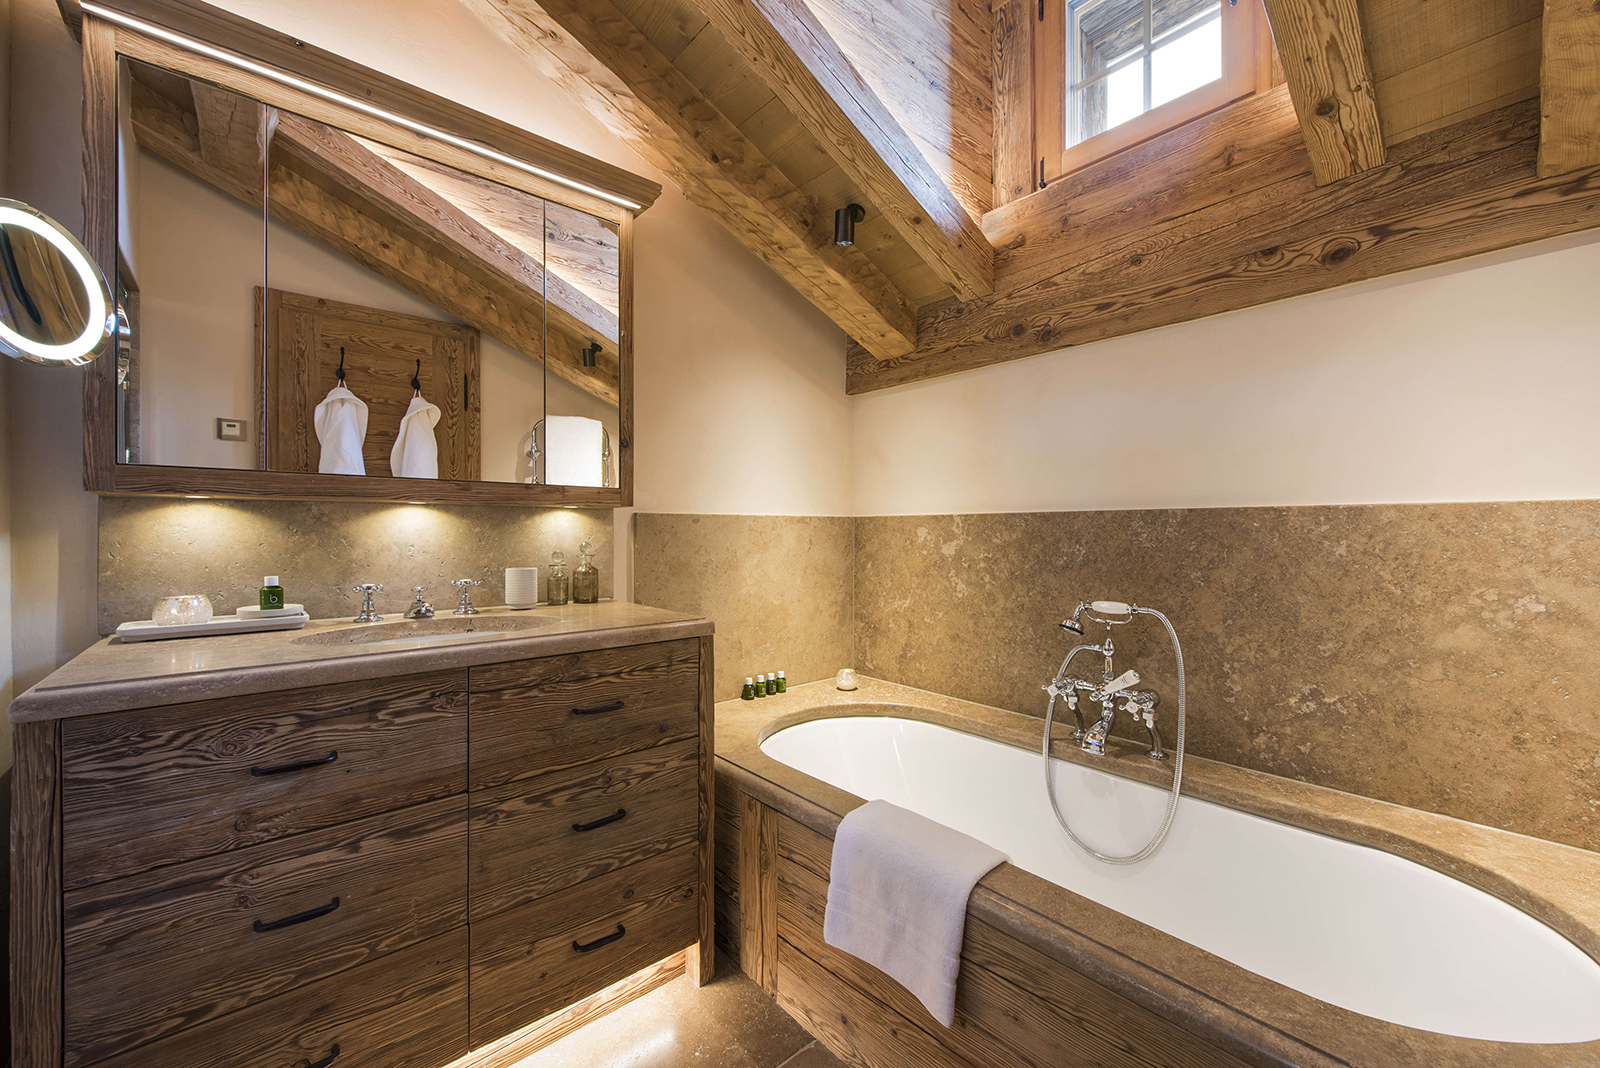 Chalet Bathroom Lighting design